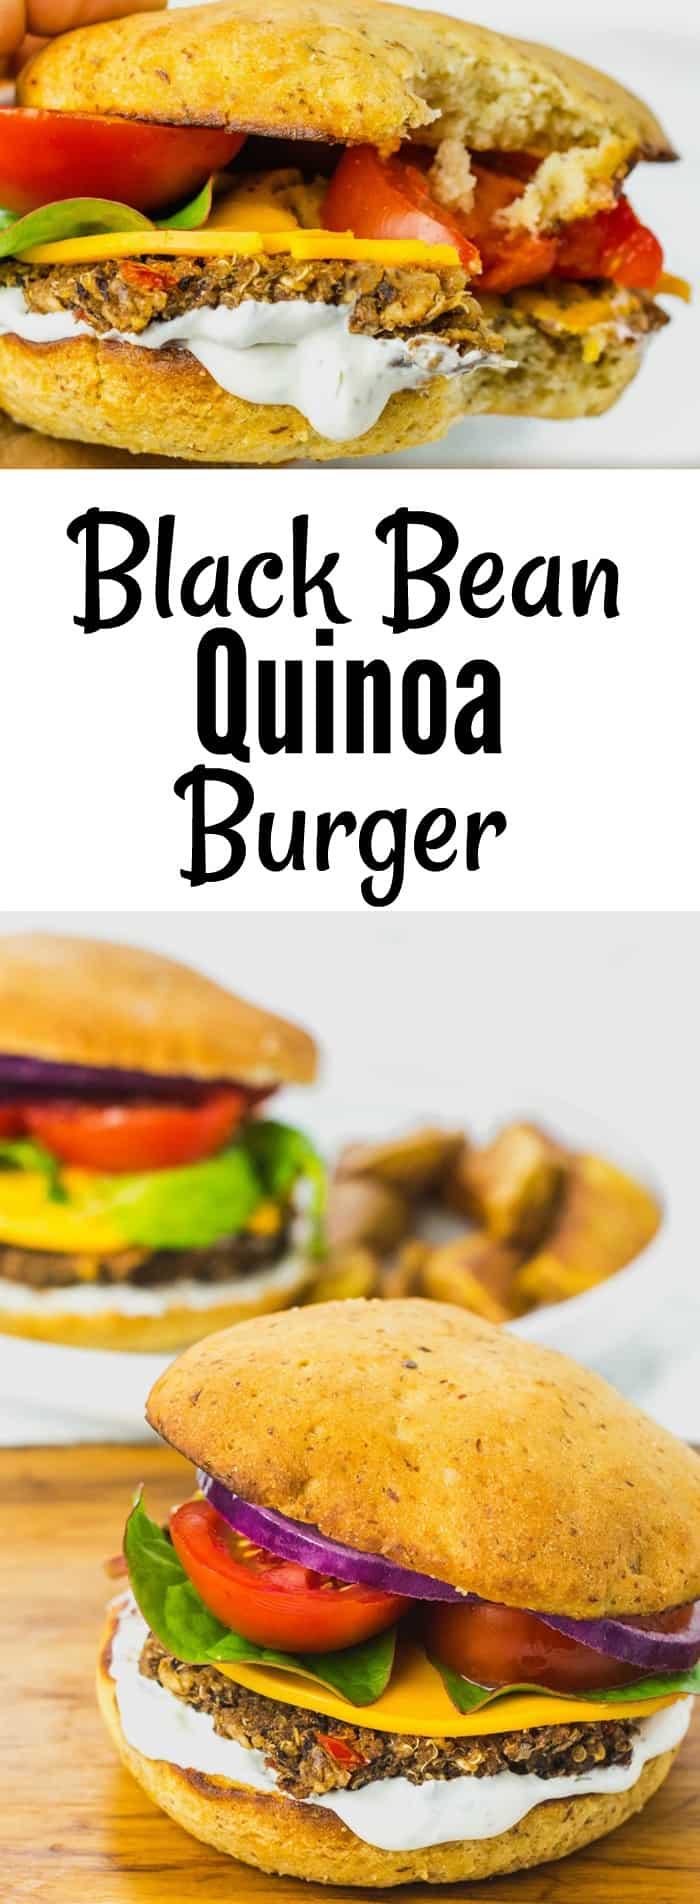 Black Bean Quinoa Burger pin